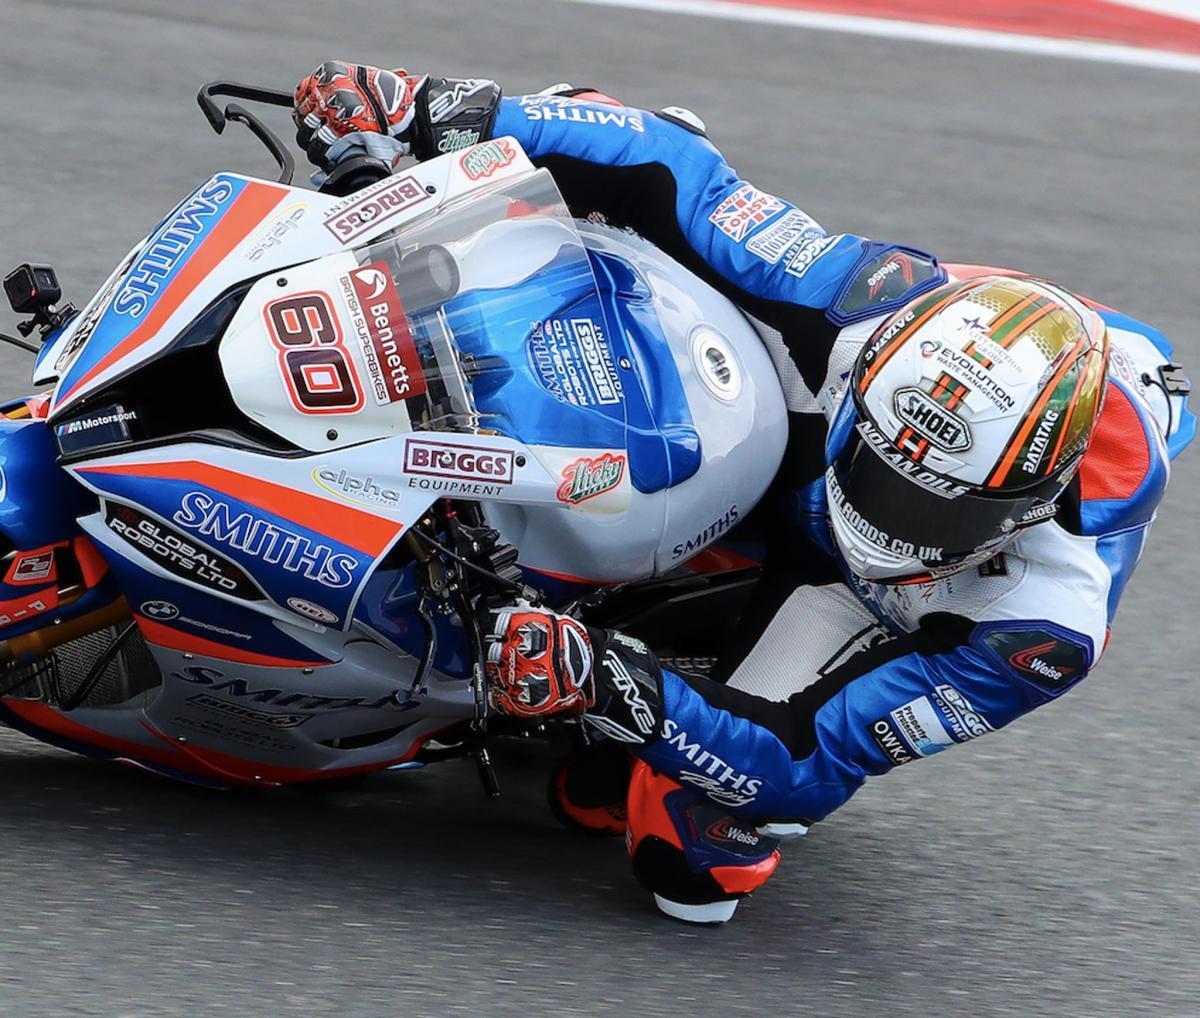 TT star Hickman dominates Ulster GP